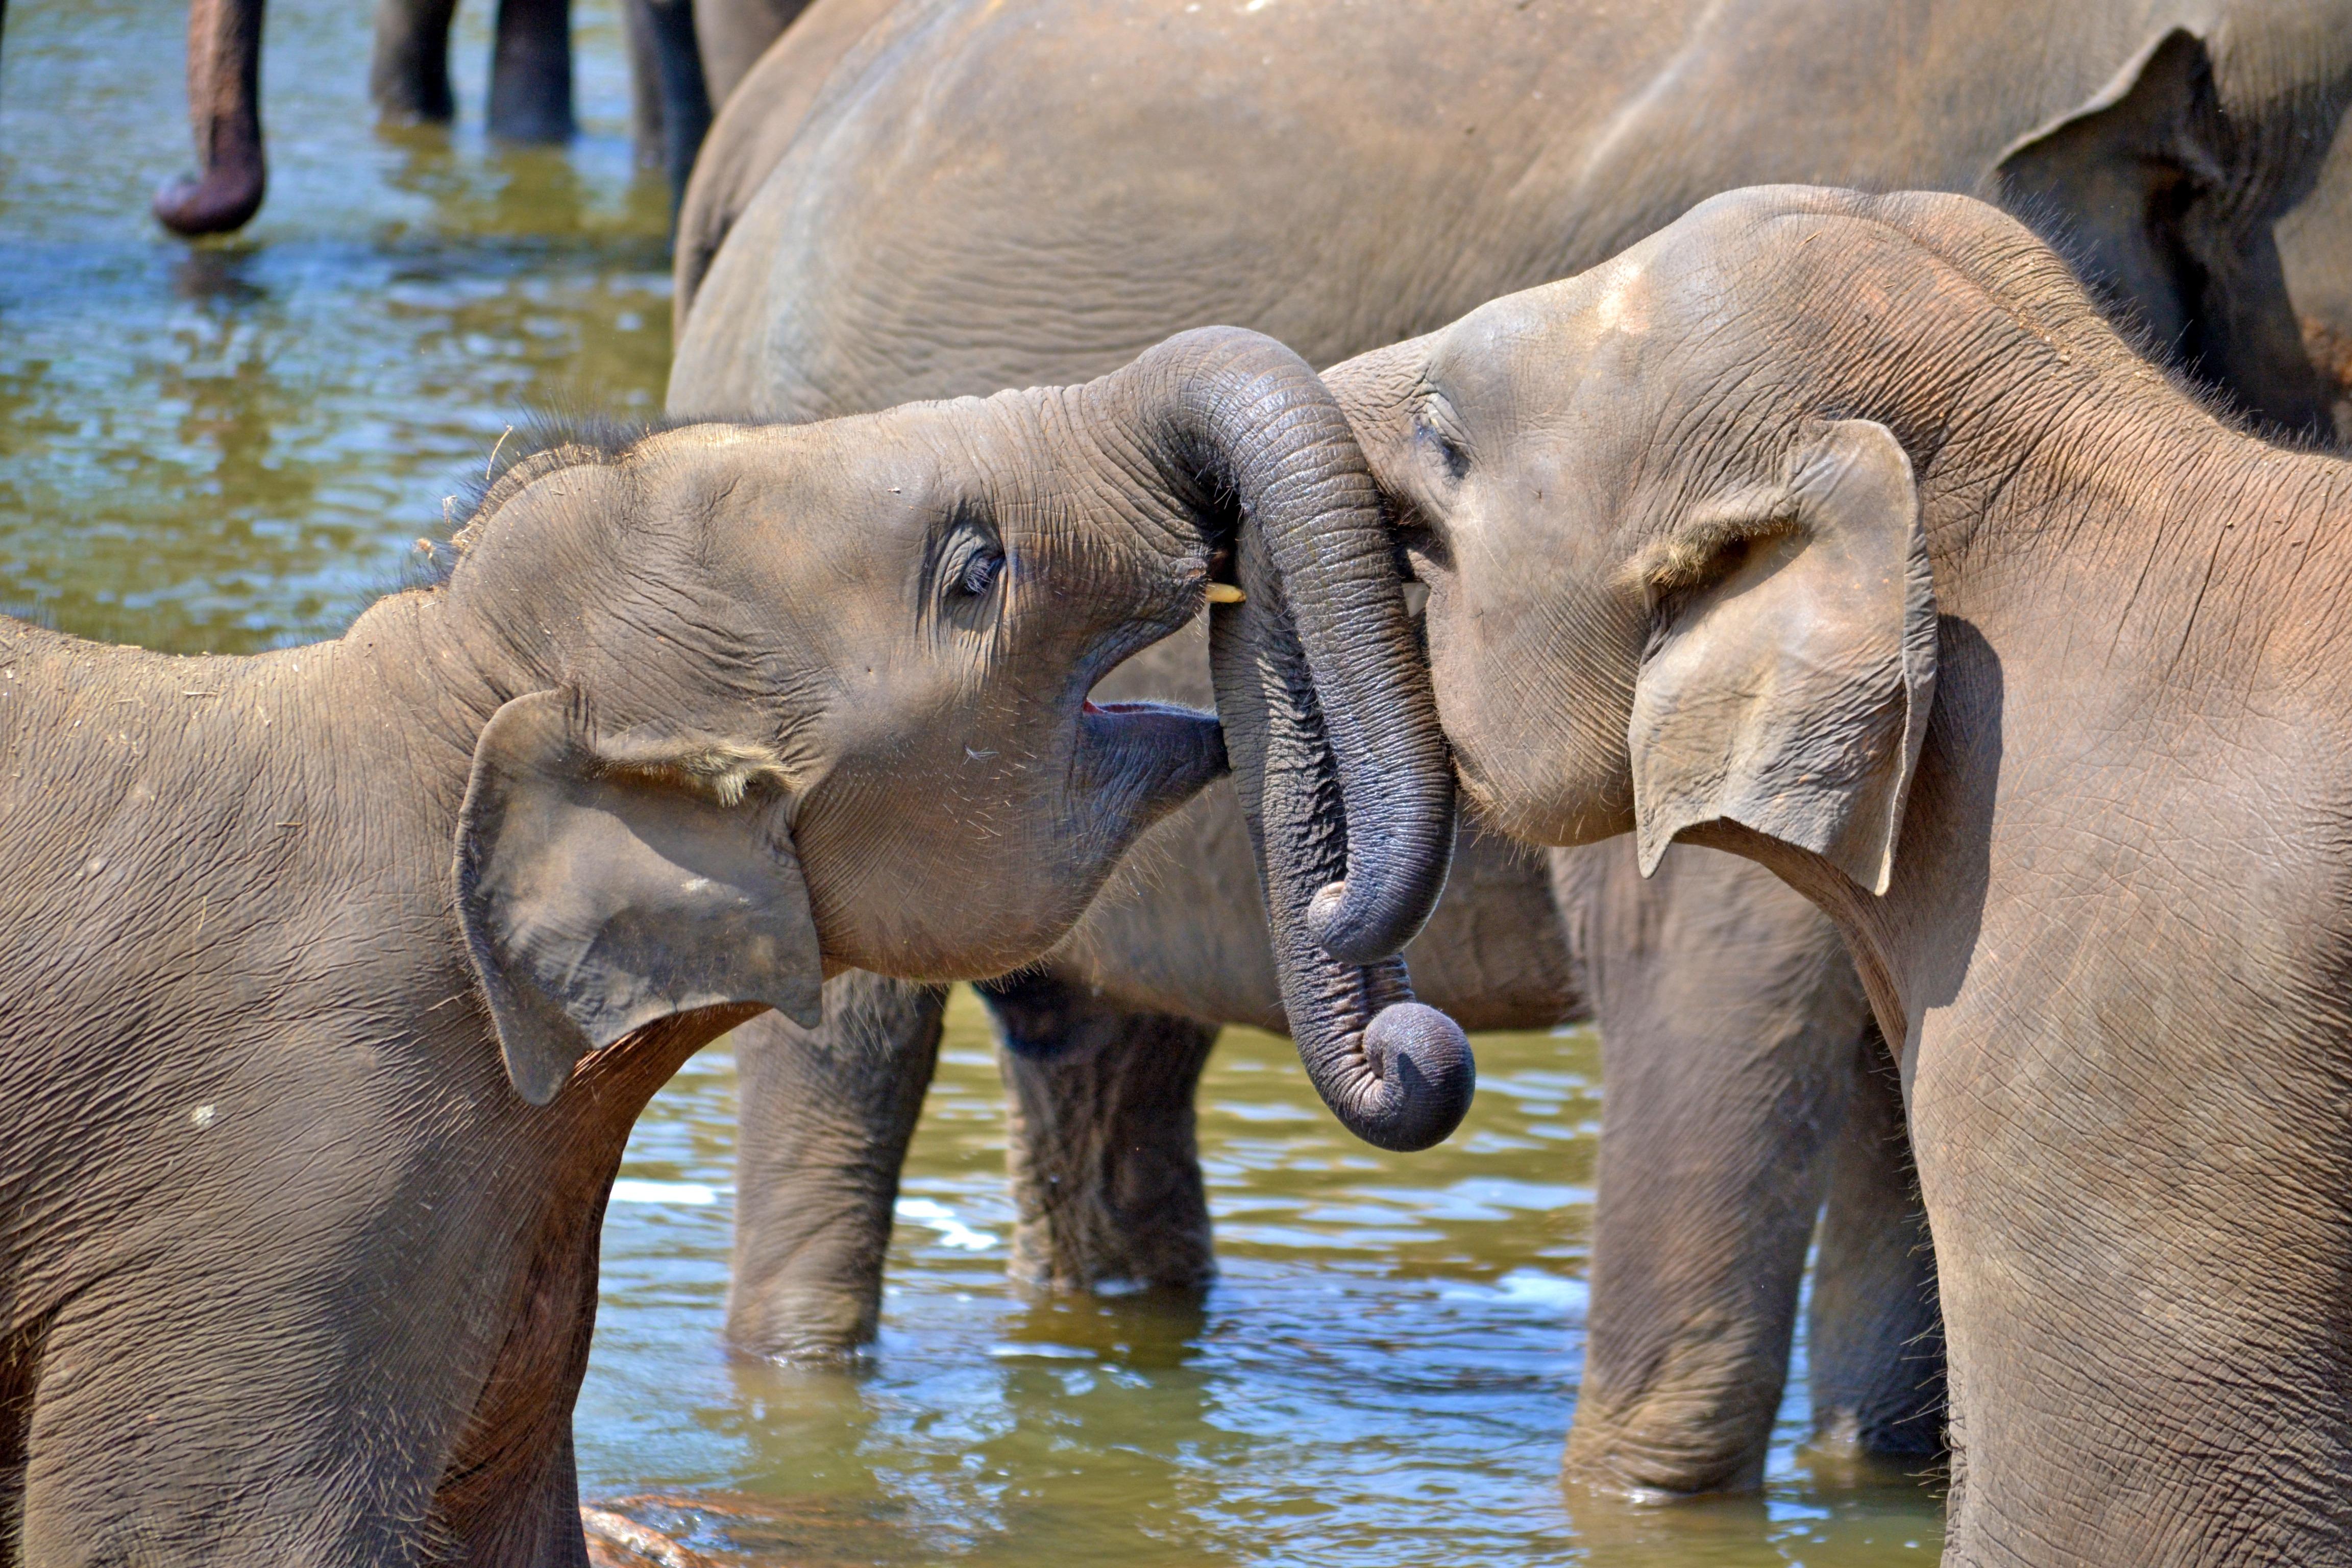 Sri Lanka - Elephants